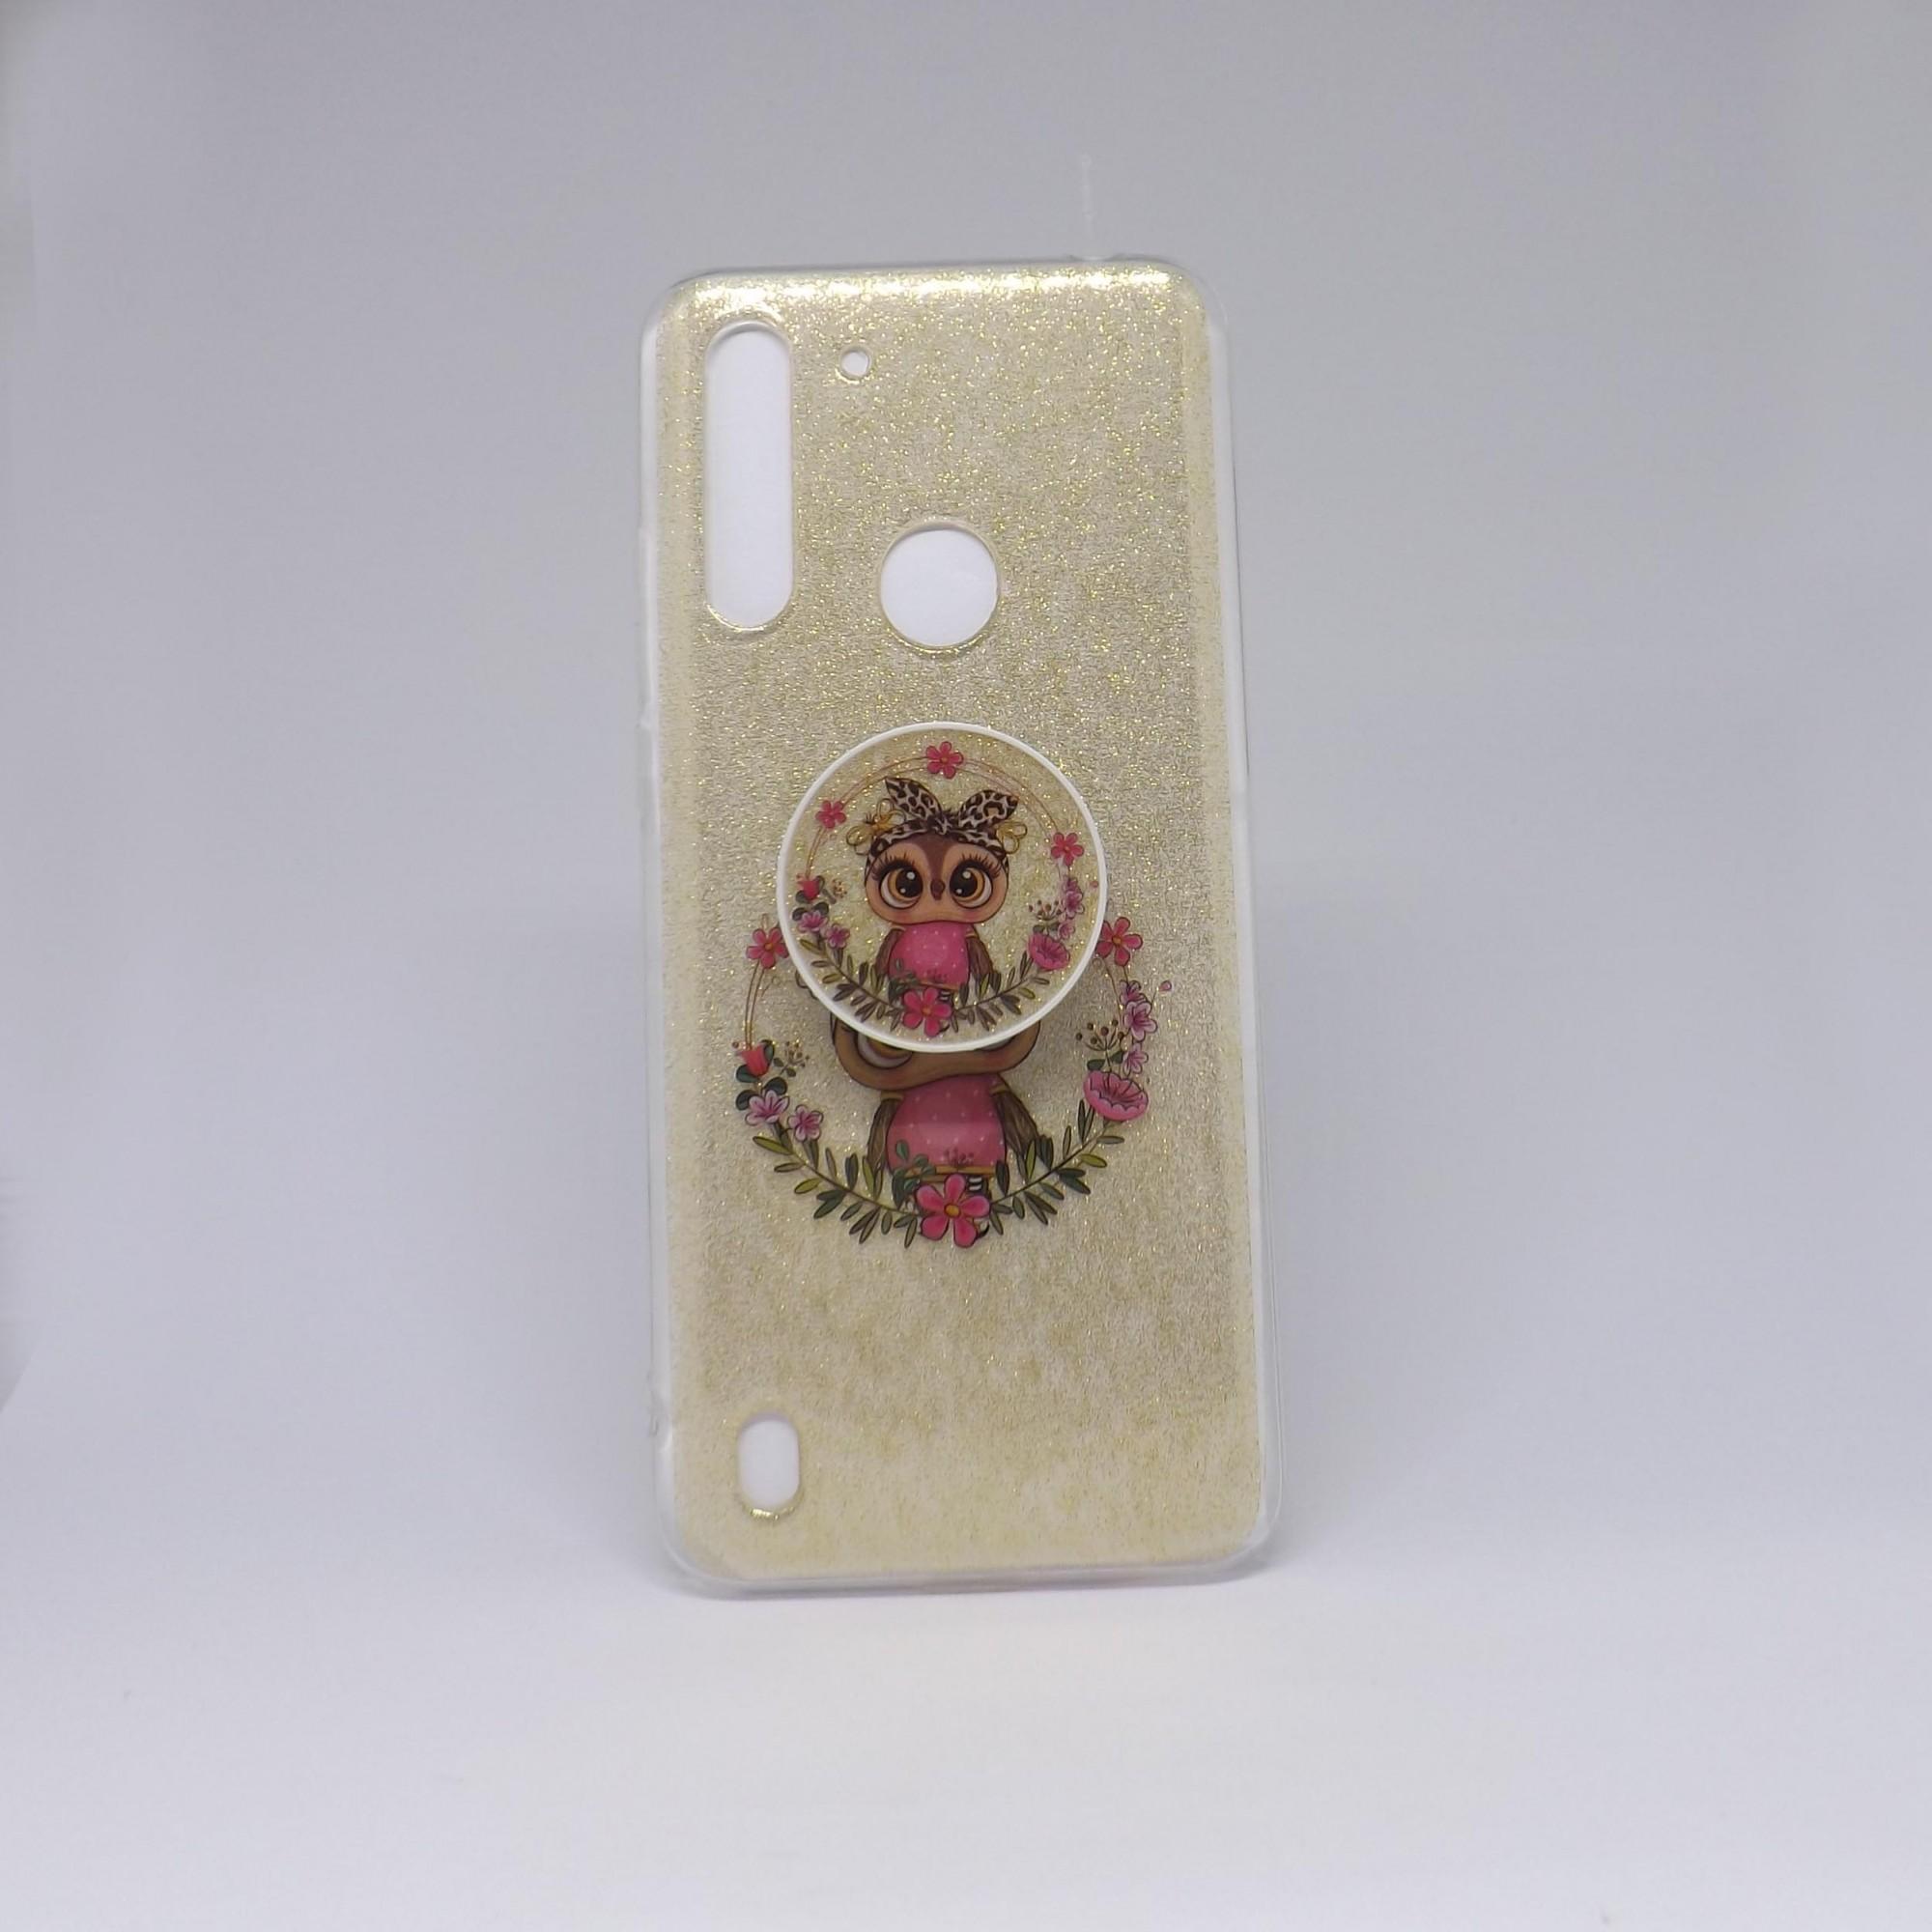 Capa Motorola G8 Power Lite Glitter com Pop Case